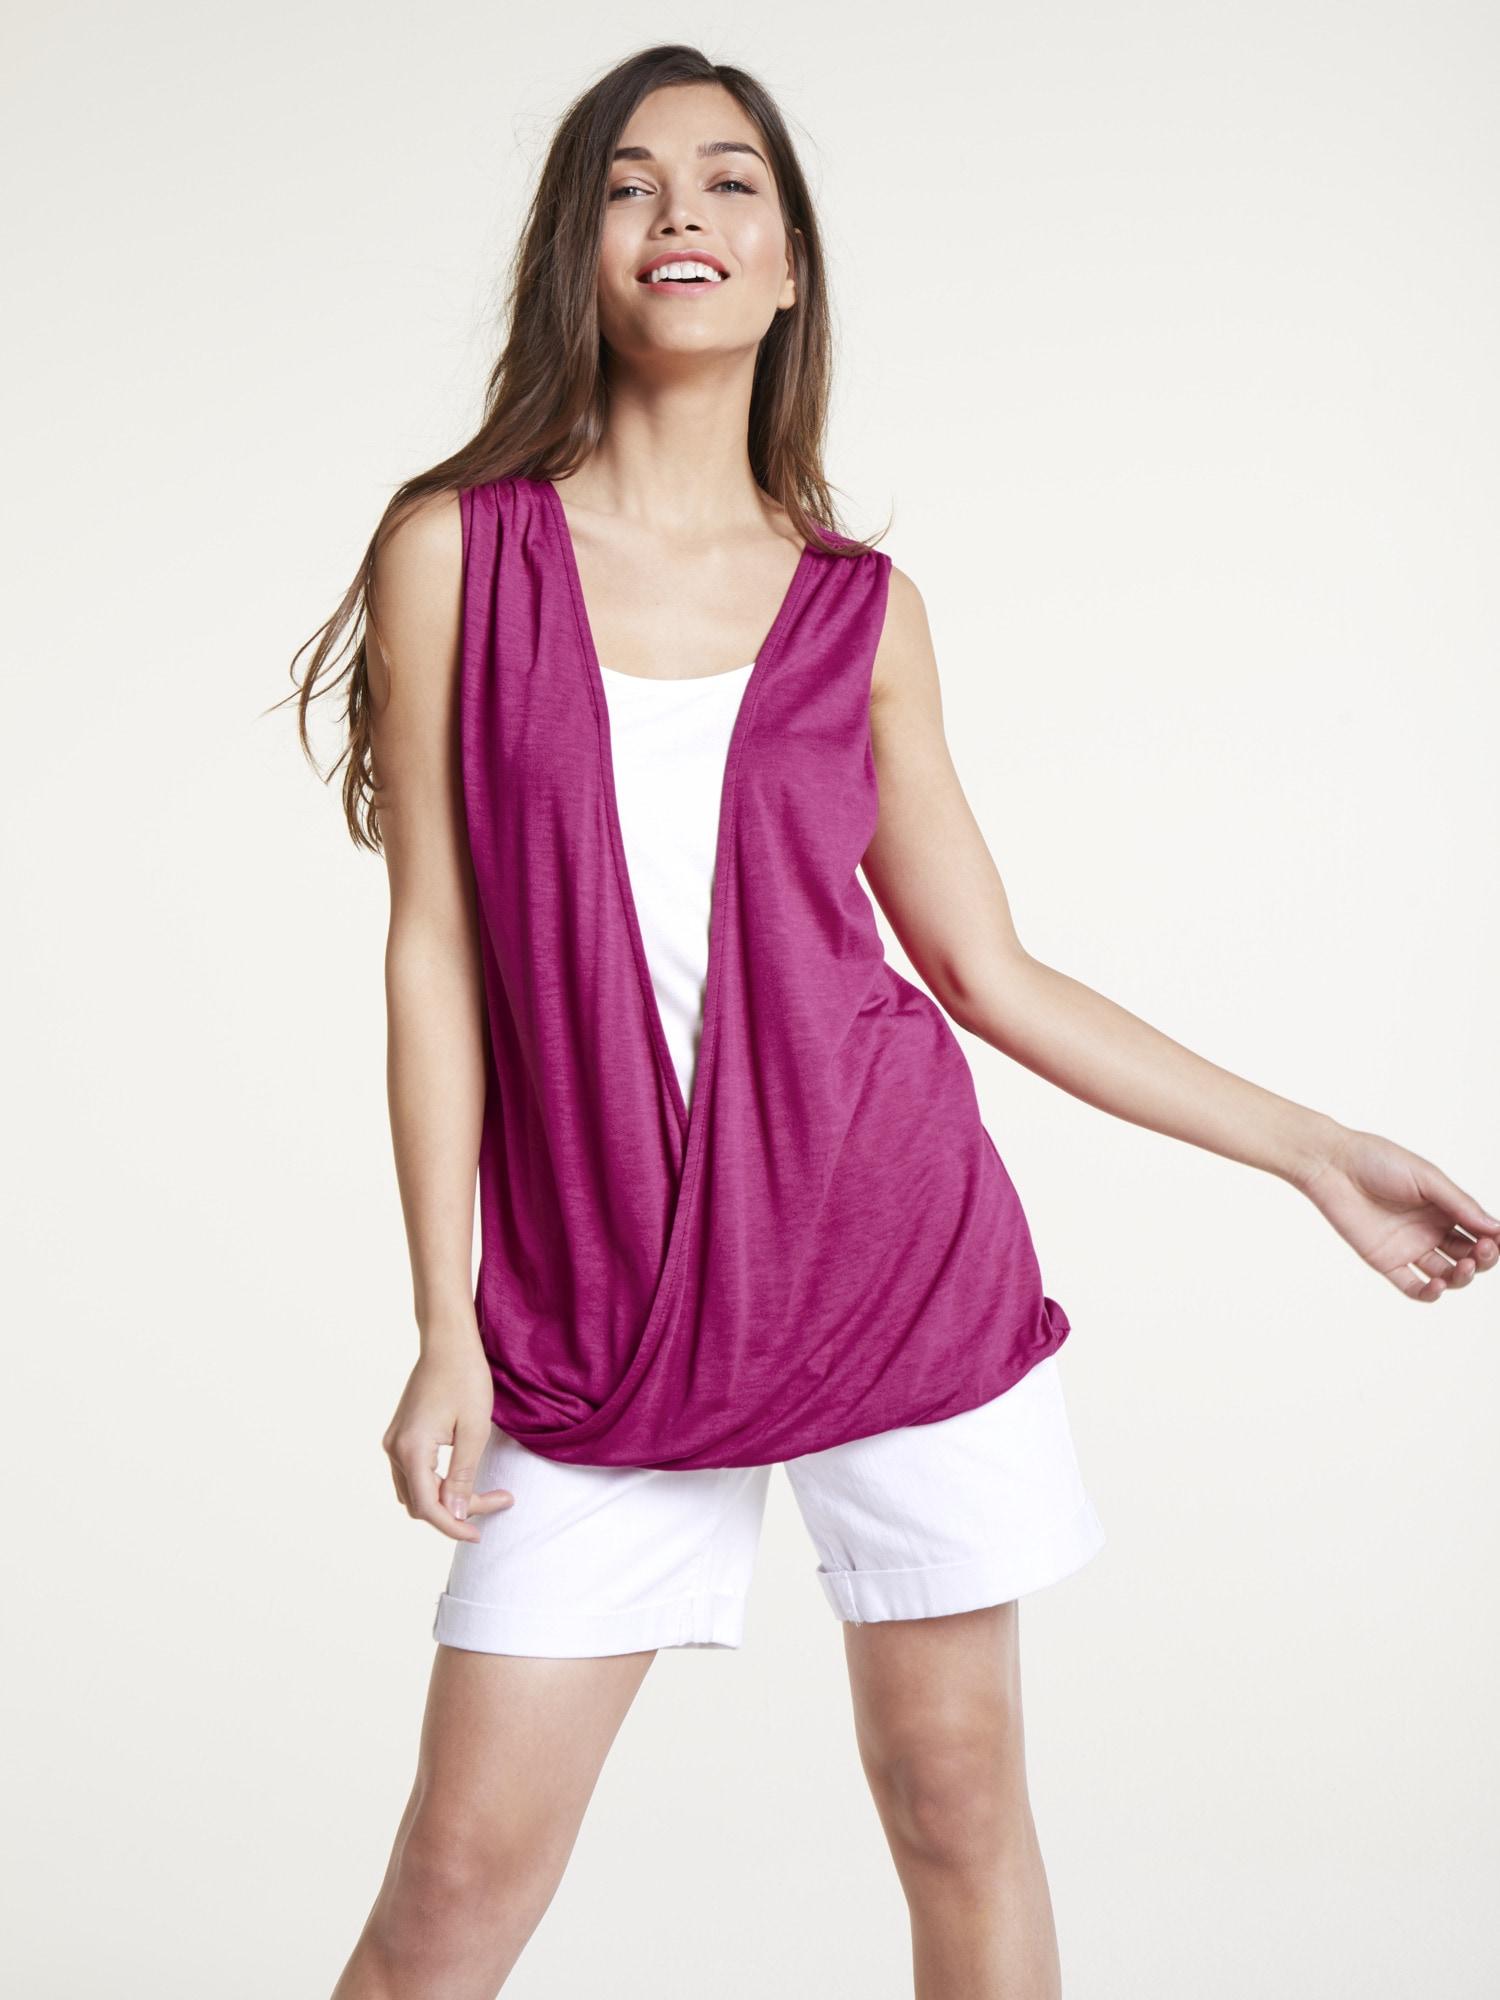 heine CASUAL Shirttop Two-in-One Optik | Bekleidung > Tops > 2-in-1-Tops | Lila | Viskose | Heine Casual